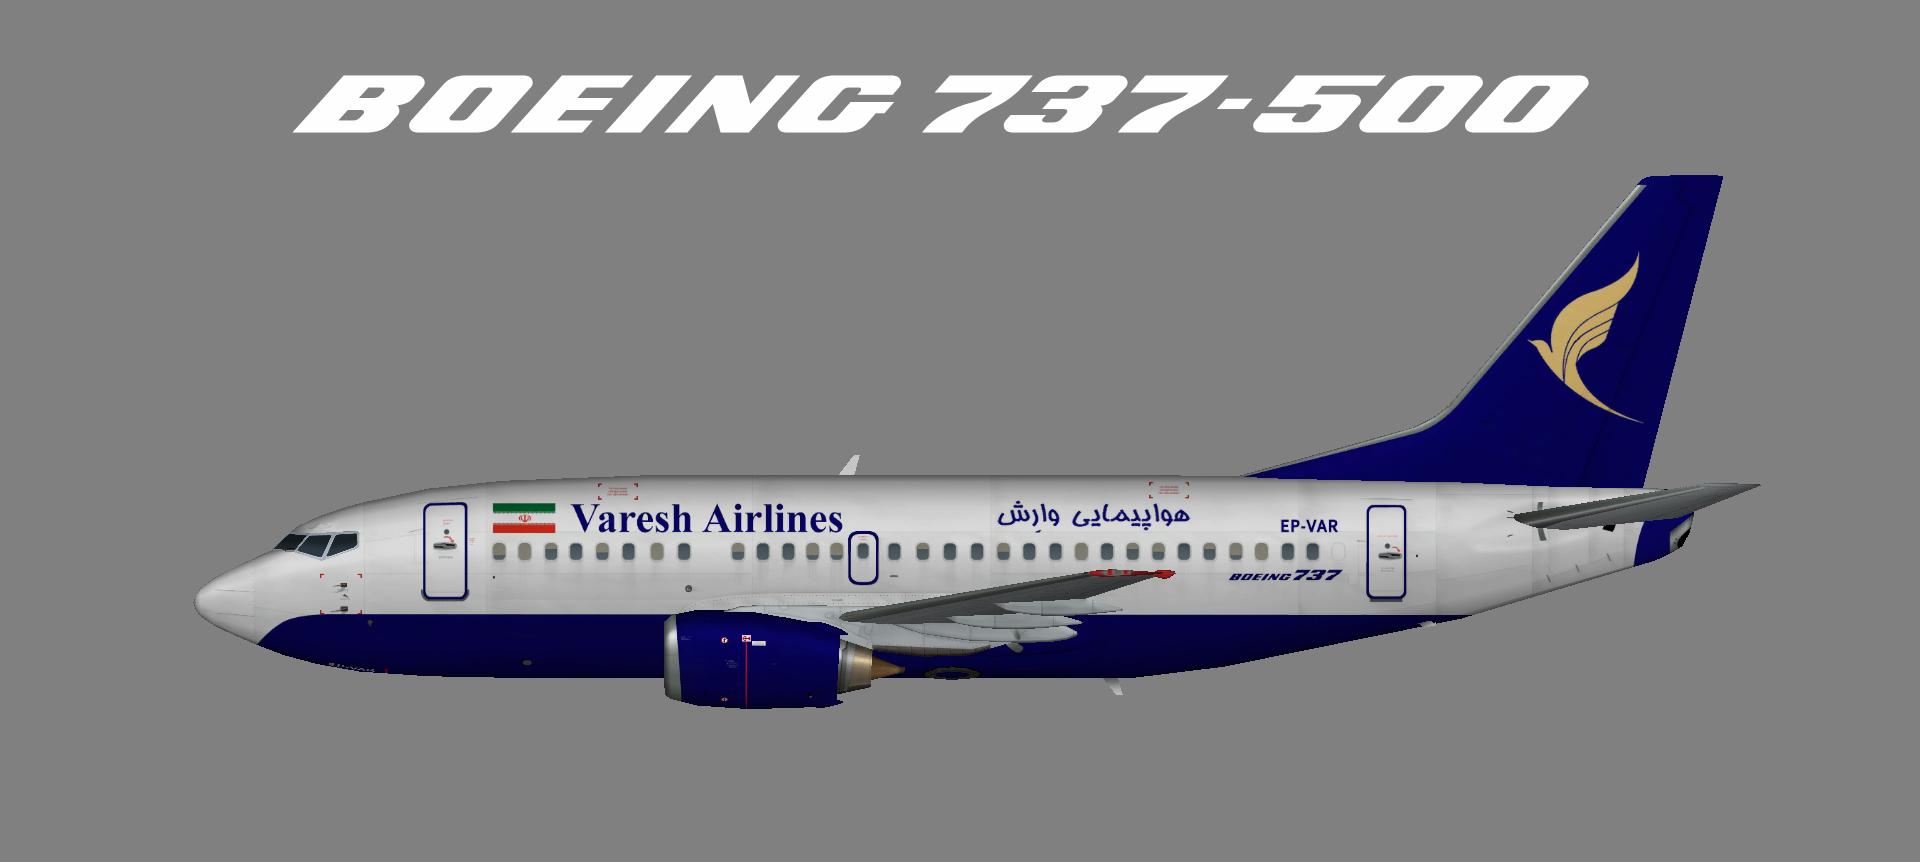 Varesh Airlines Boeing 737-500